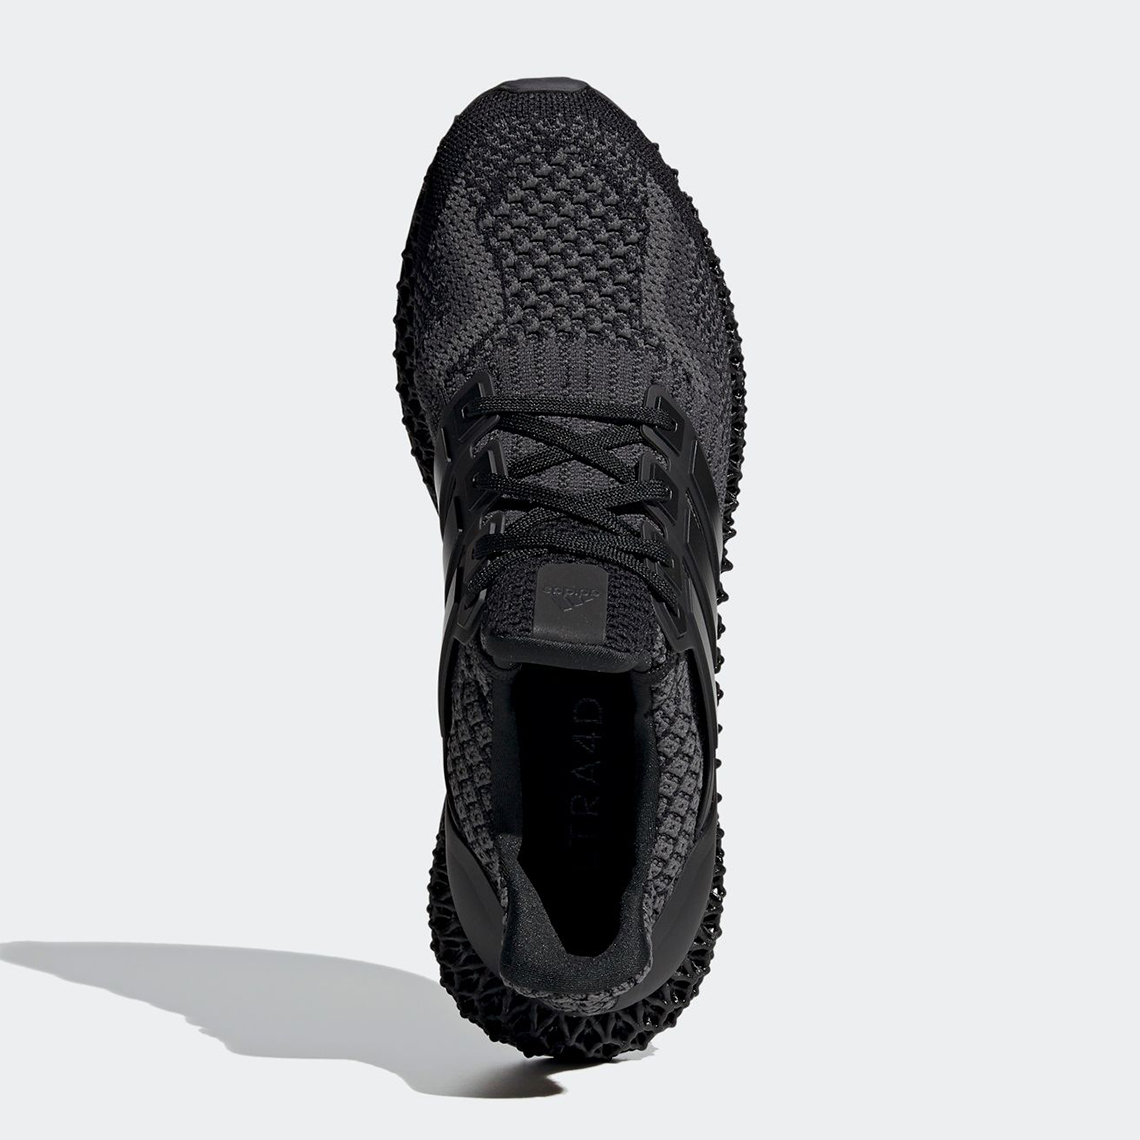 adidas-ultra-4d-core-black-carbon-G58160-2.jpg?w=1140